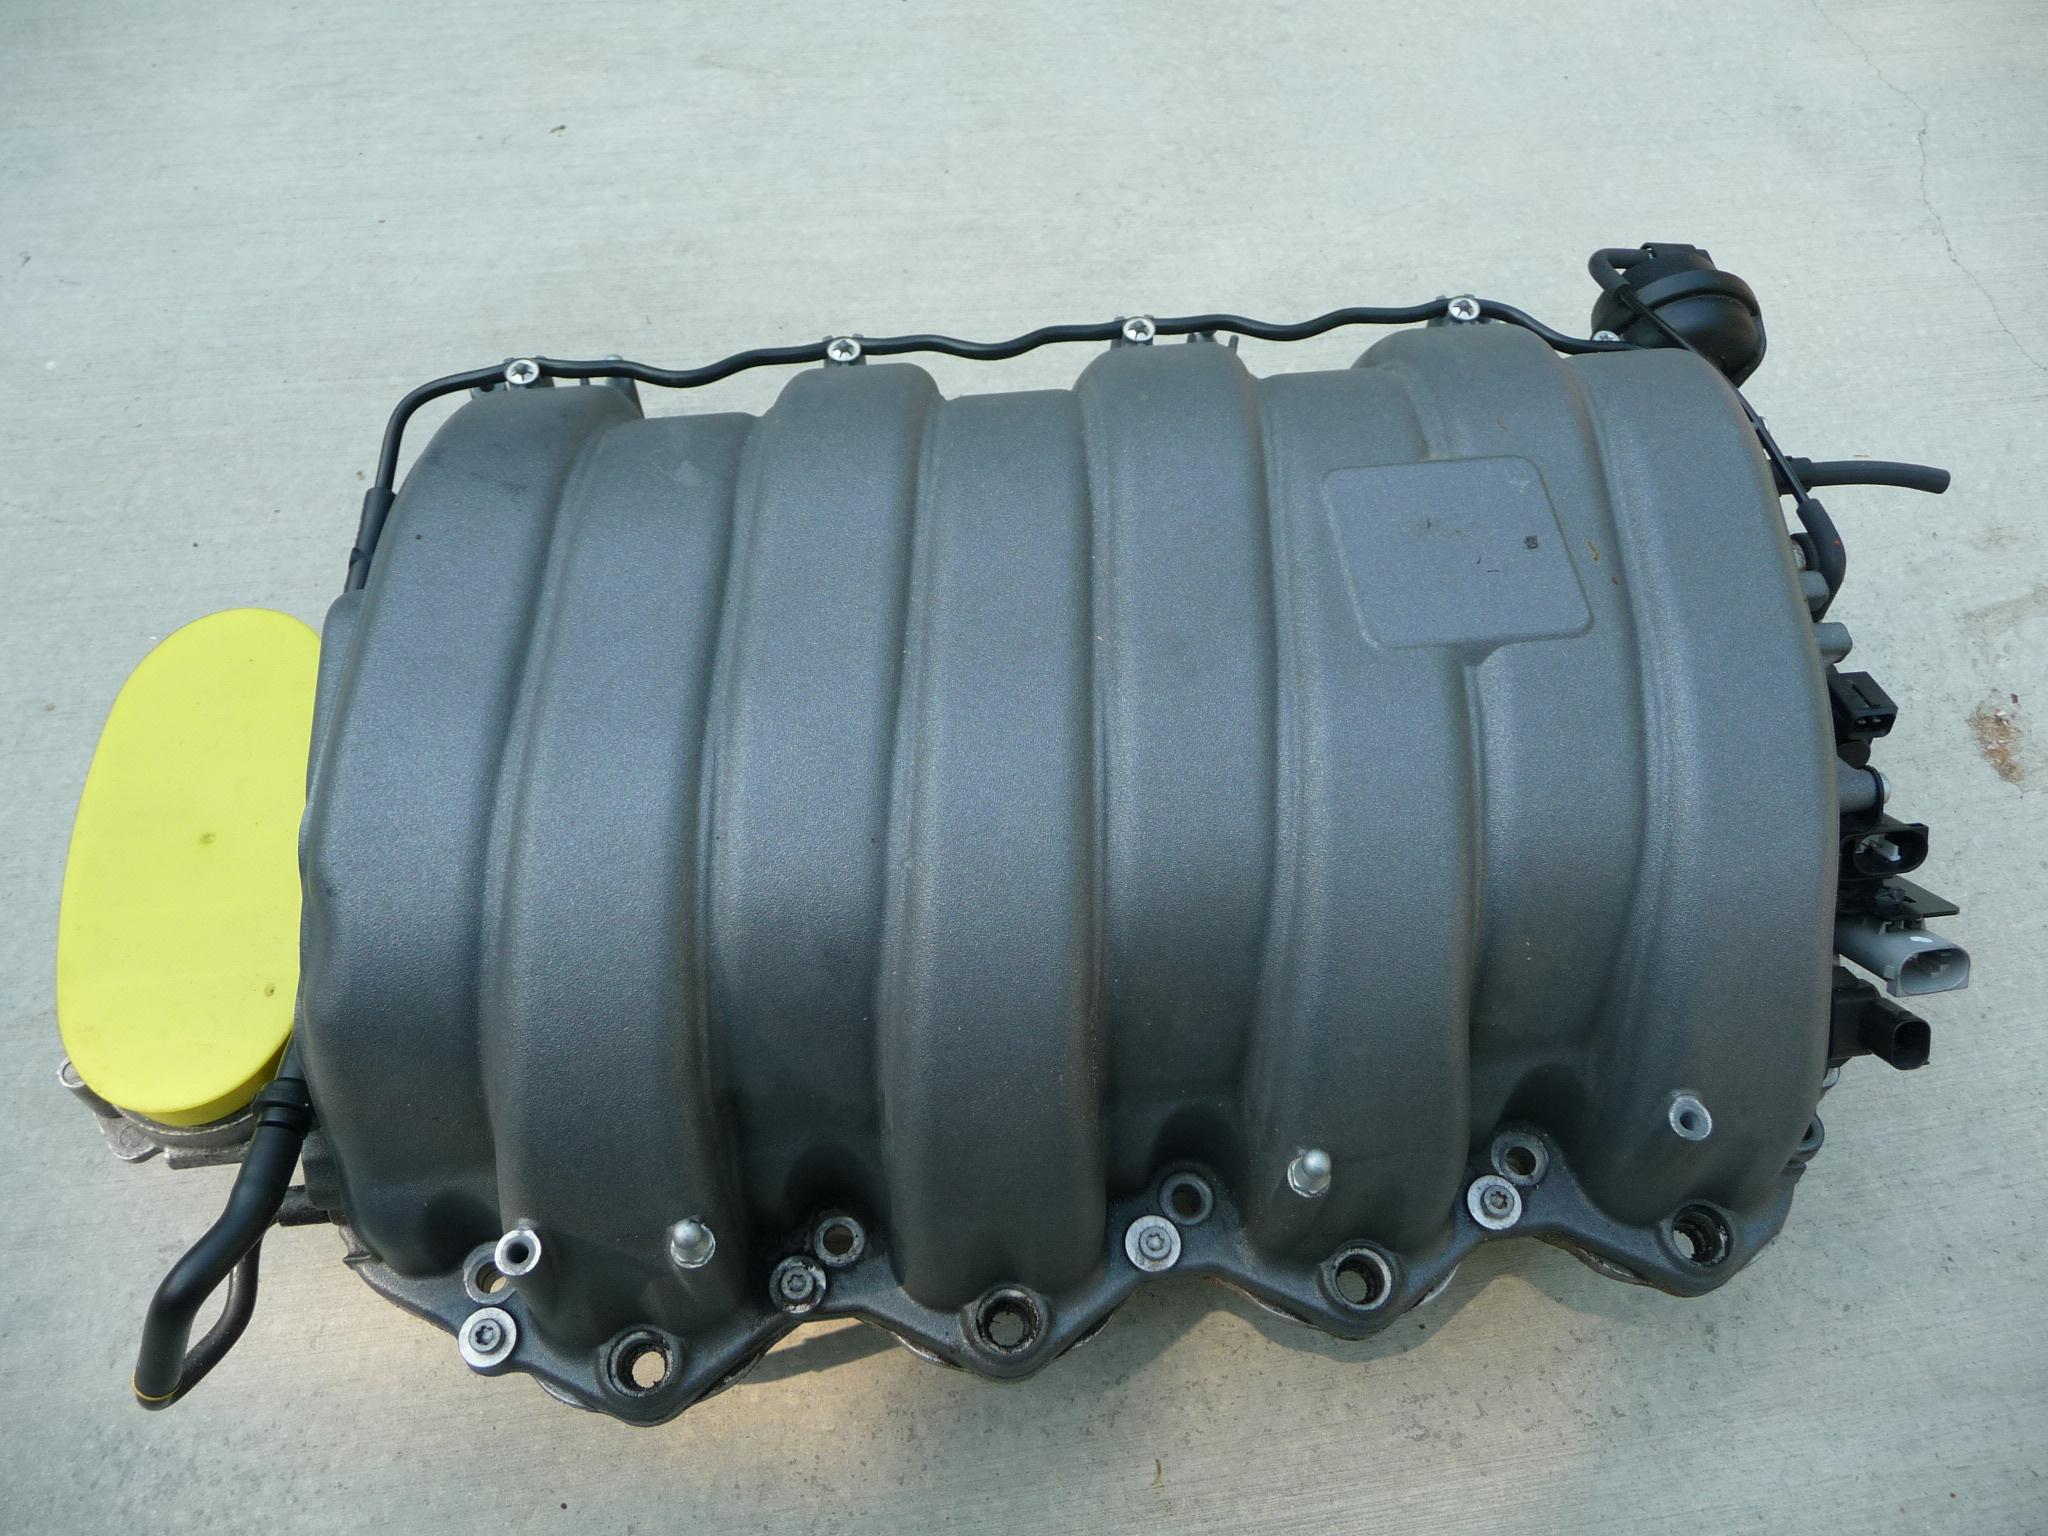 Mercedes Benz AMG M156 V8 Engine Intake Manifold Core 1561401601 OEM OE